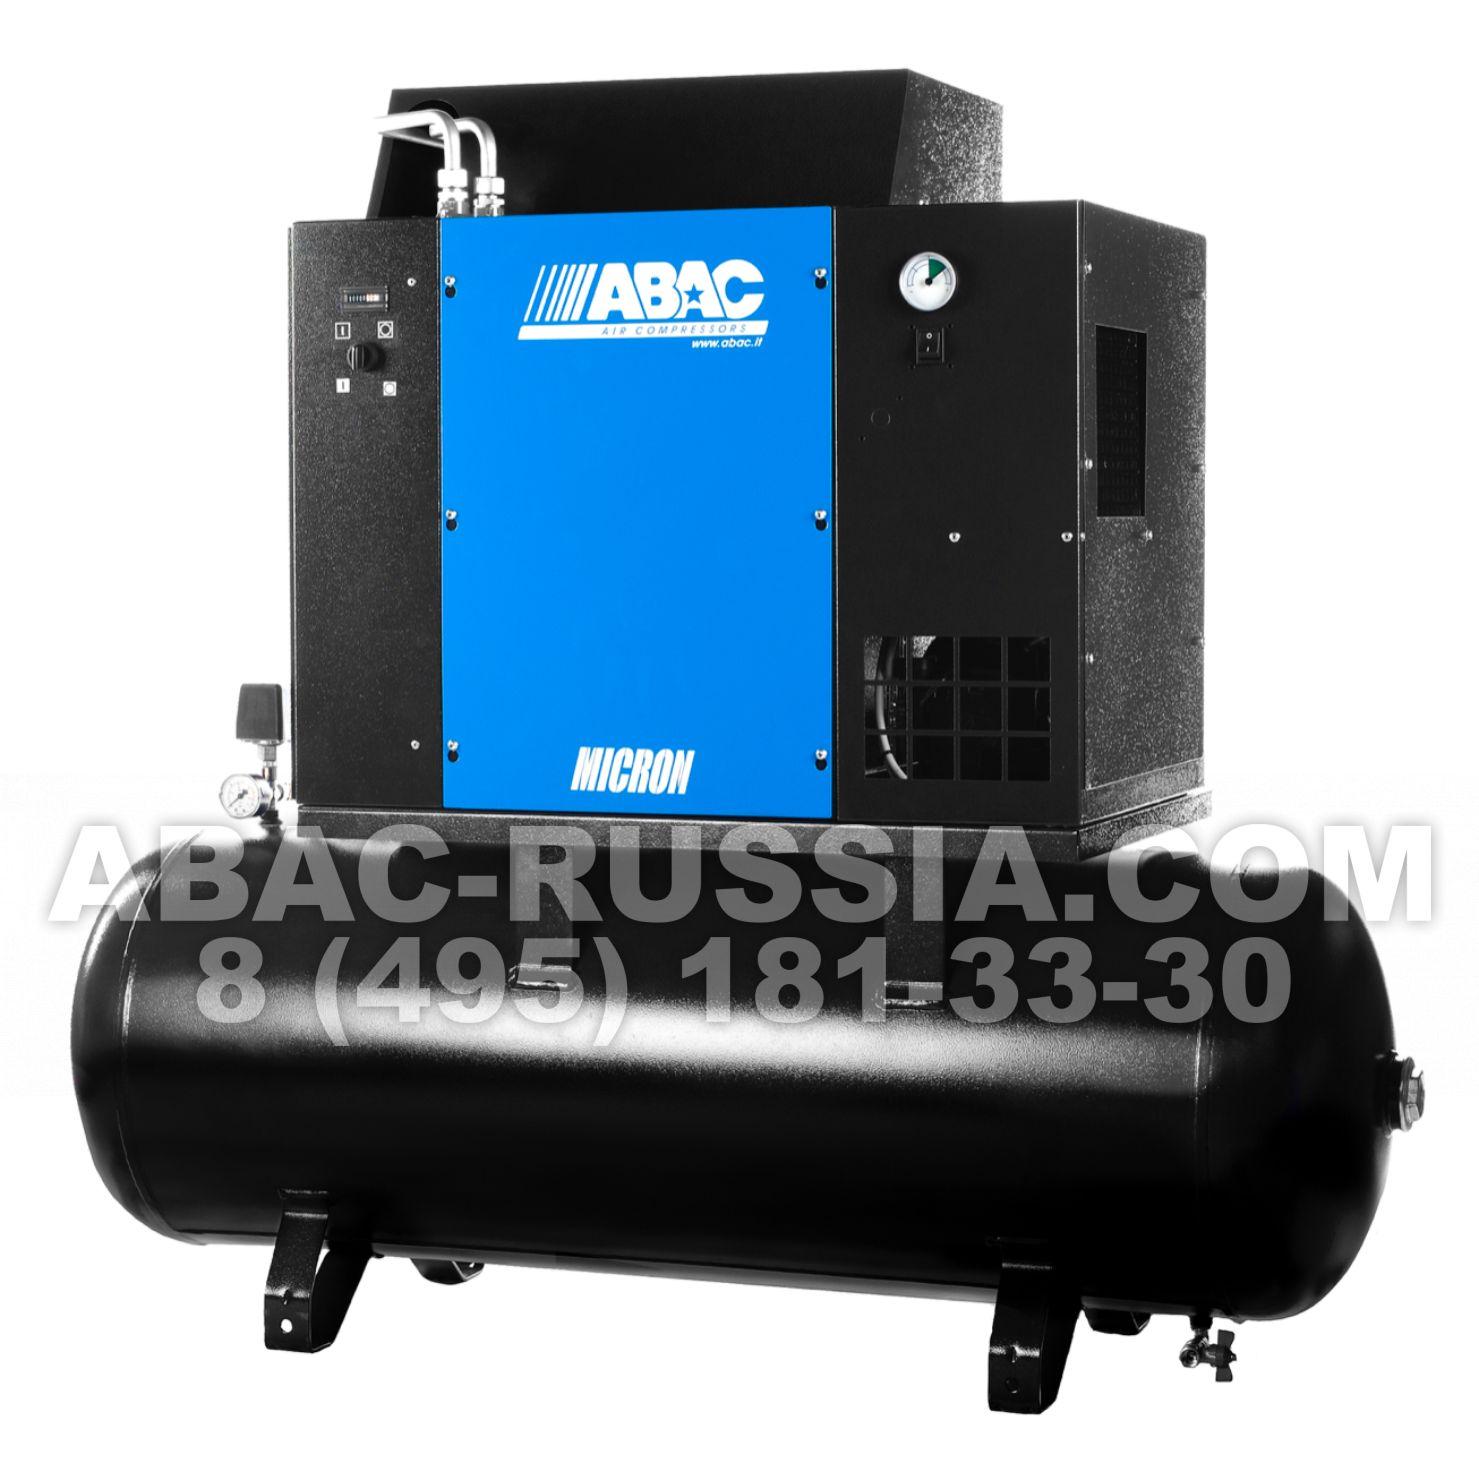 Винтовой компрессор ABAC MICRON.E 1108 - 270 4152012065